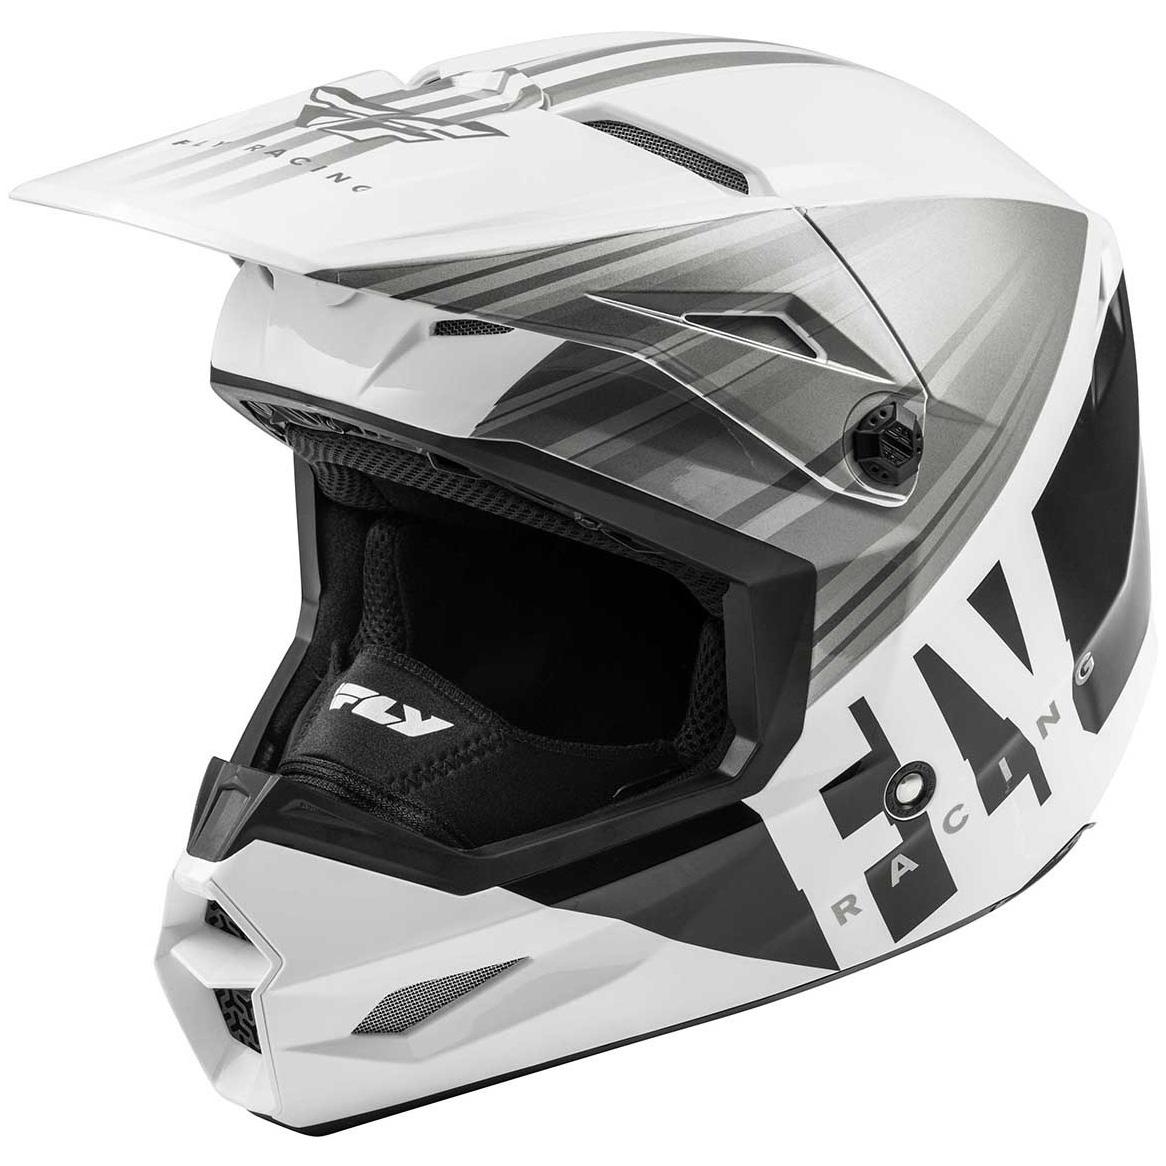 Fly Racing - 2020 Kinetic K220 шлем, бело-серо-черный